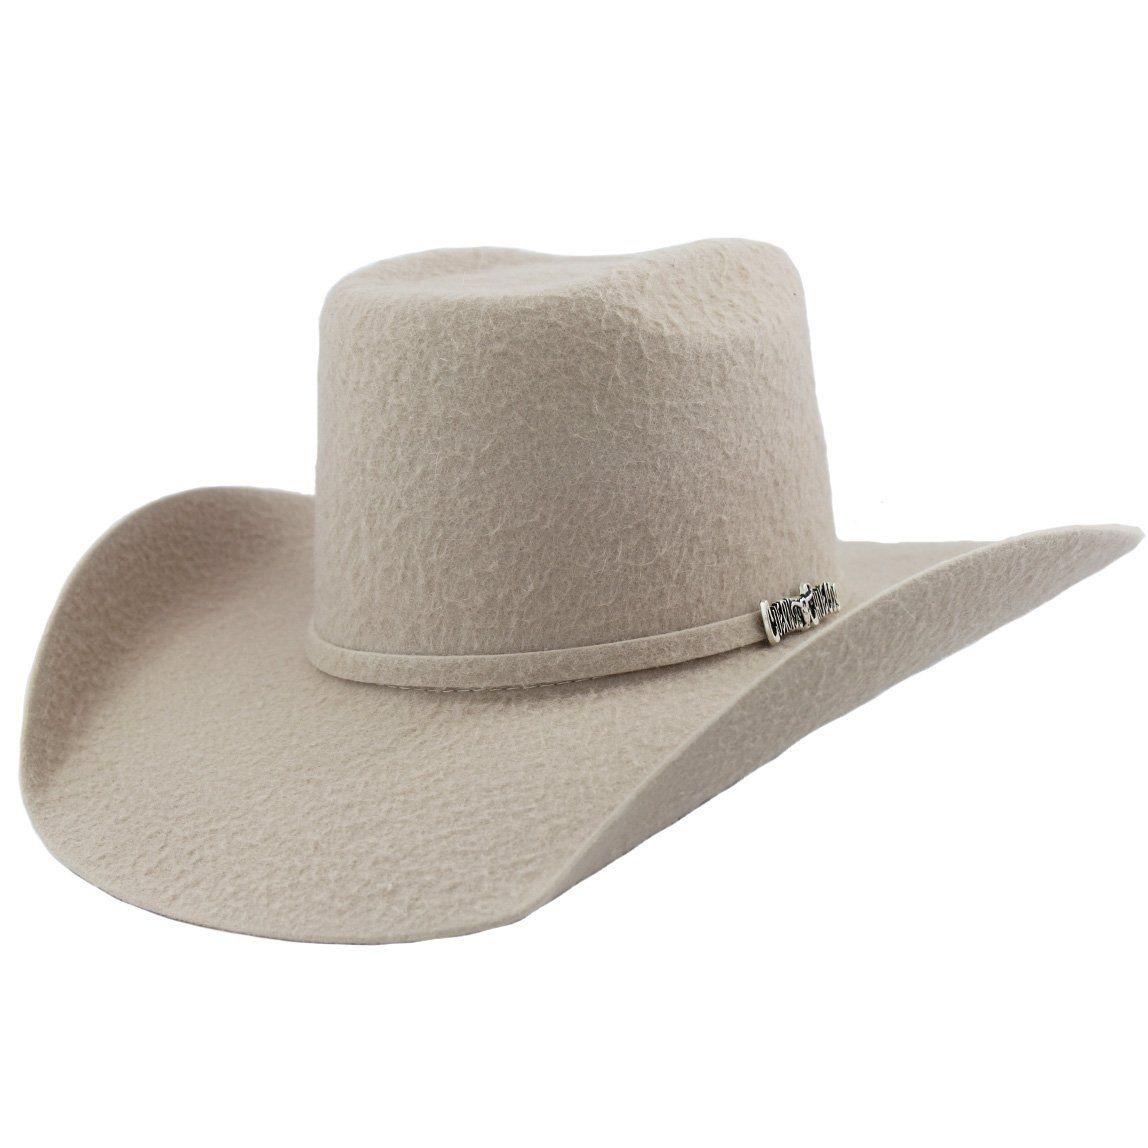 a64260ea489 Cuernos Chuecos 10x Silver Belly Grizzly Brick Crown Cowboy Hat in ...